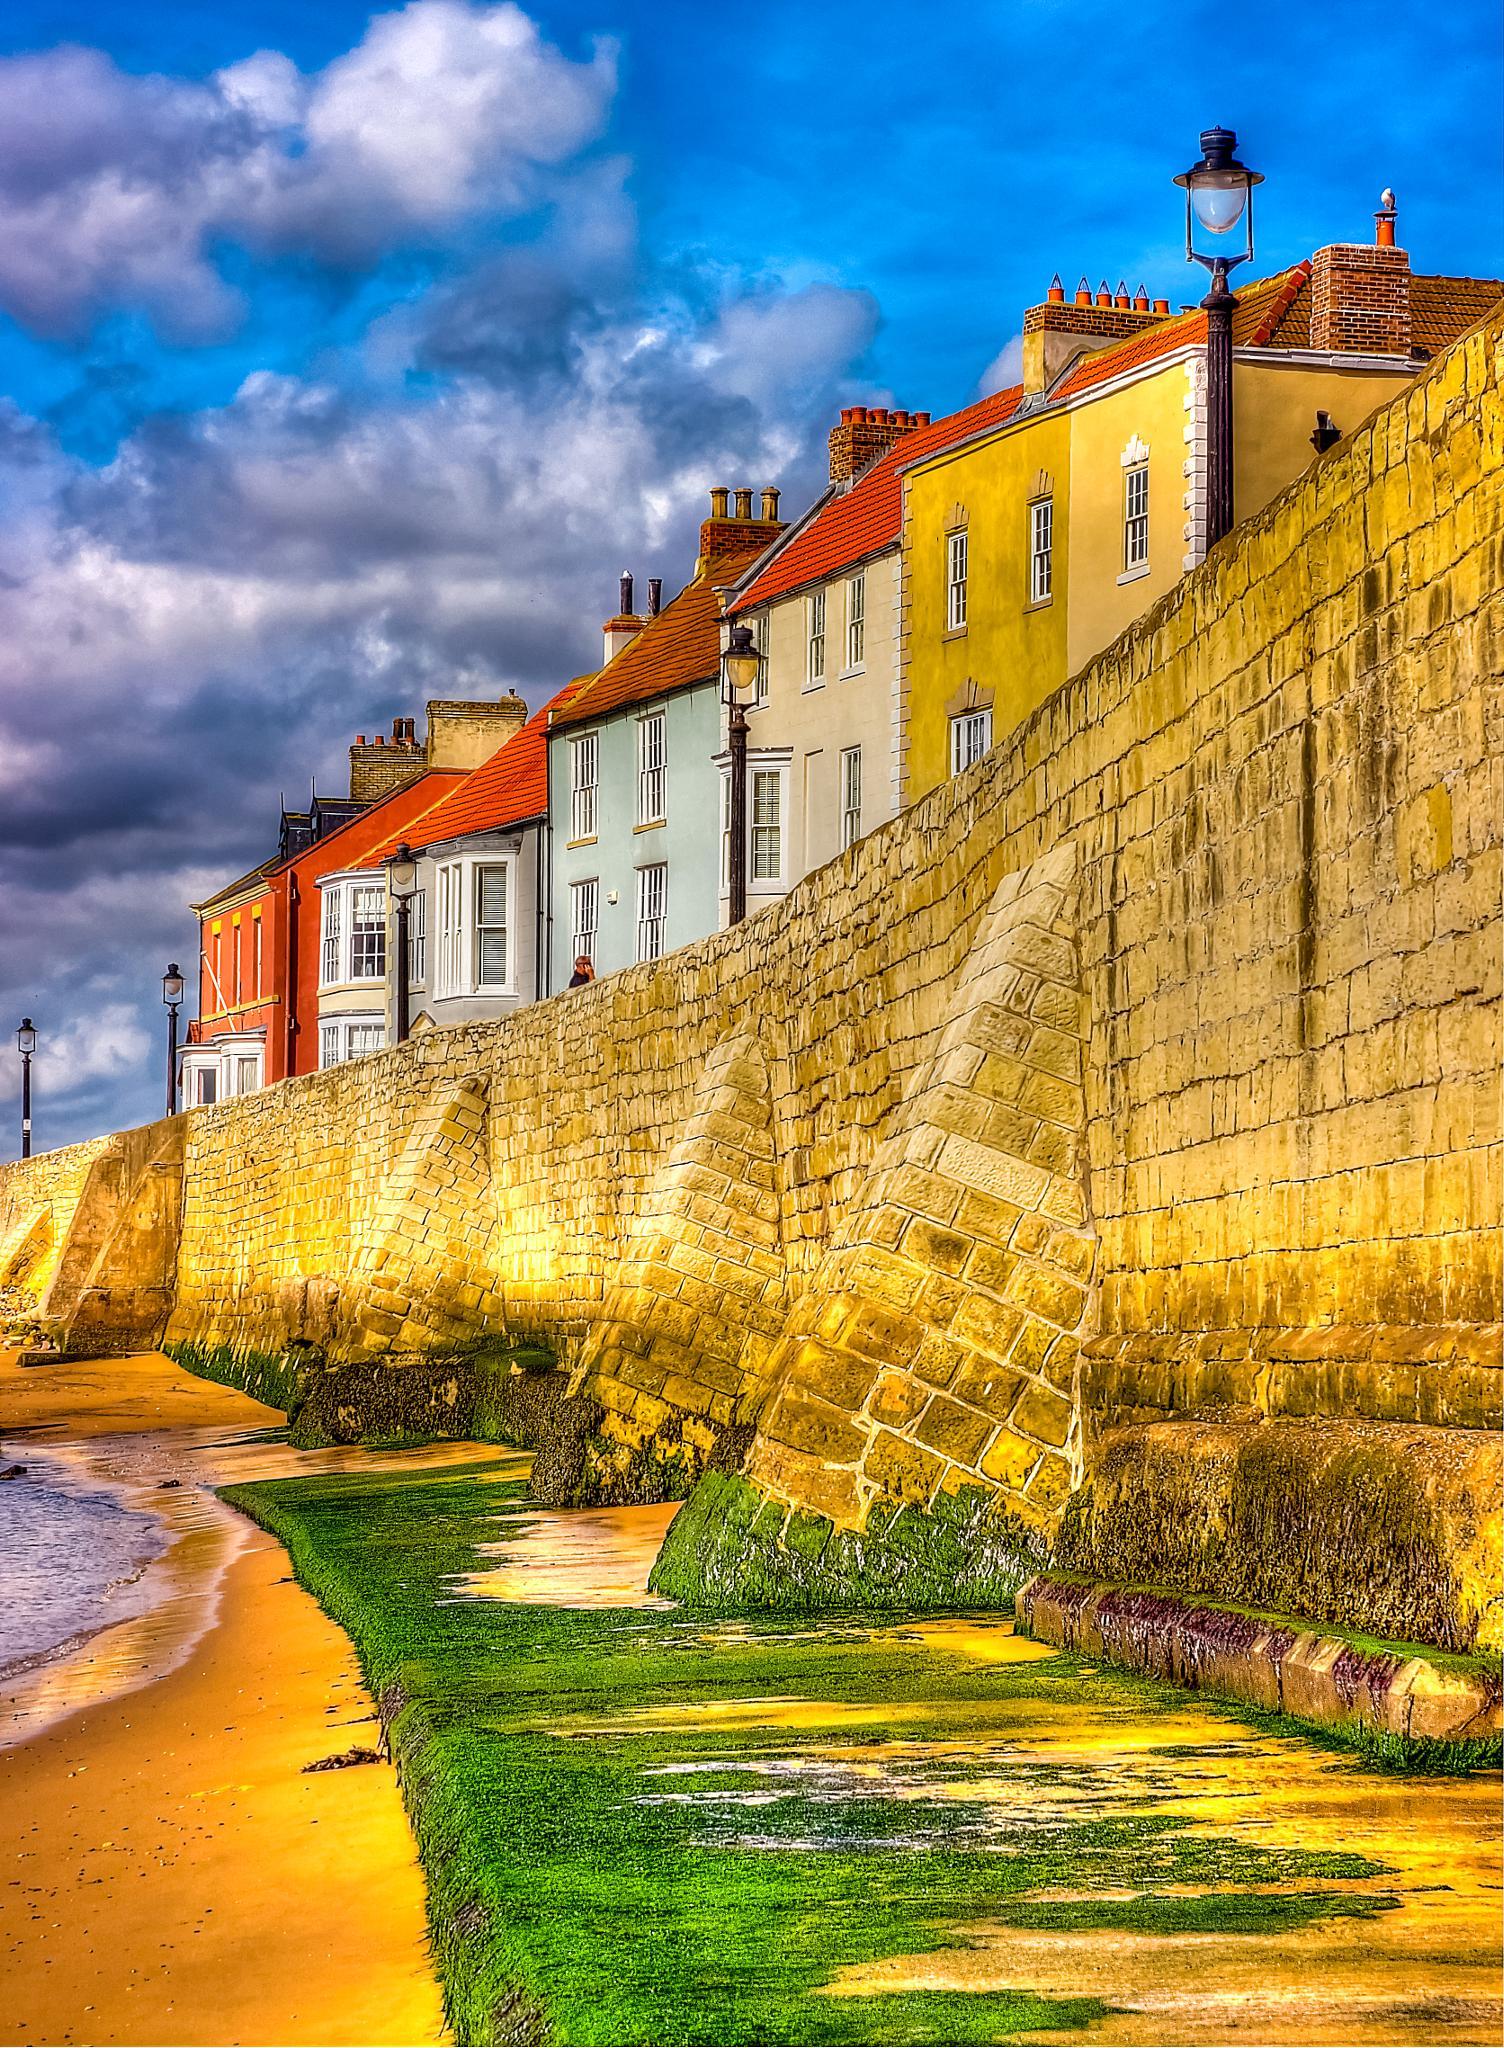 Sea wall by Peter Edwardo Vicente.